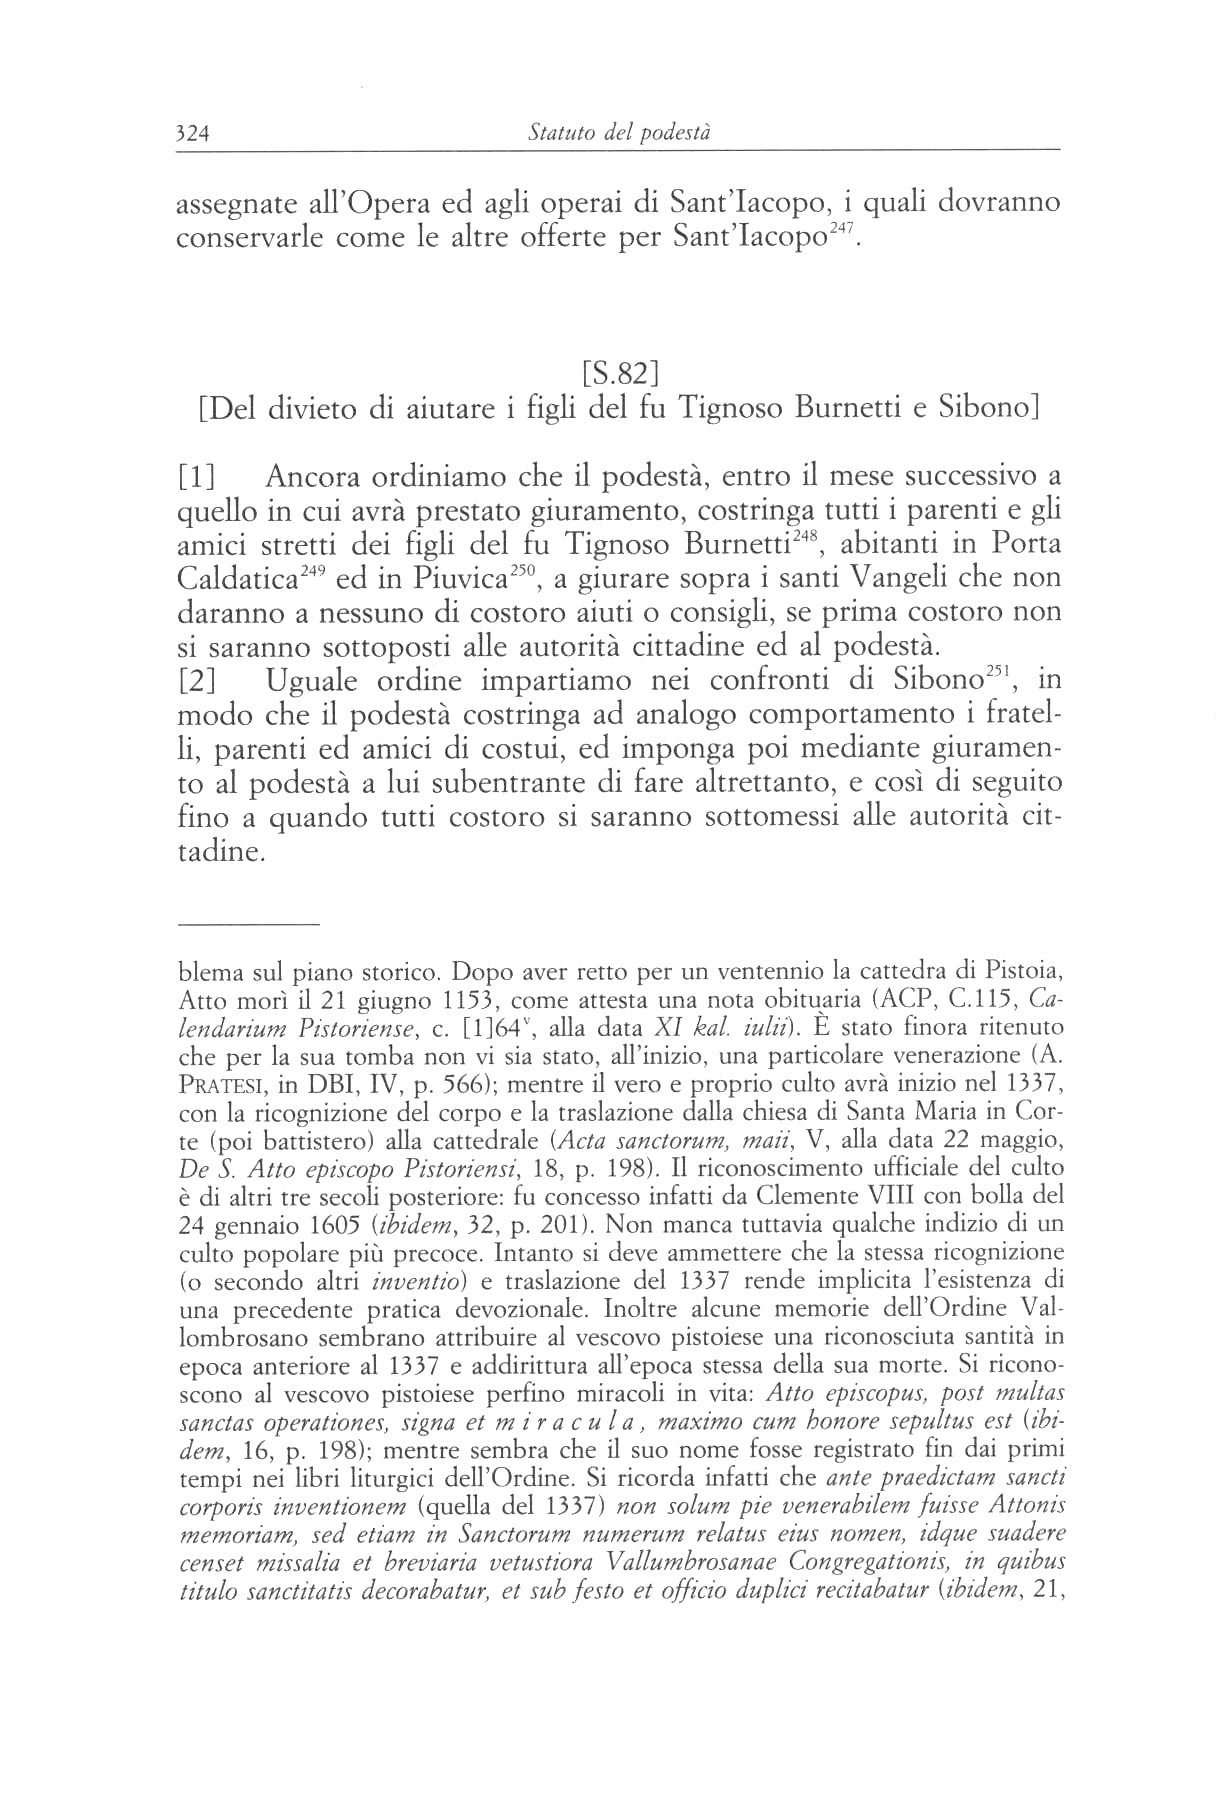 statuti pistoiesi del sec.XII 0324.jpg